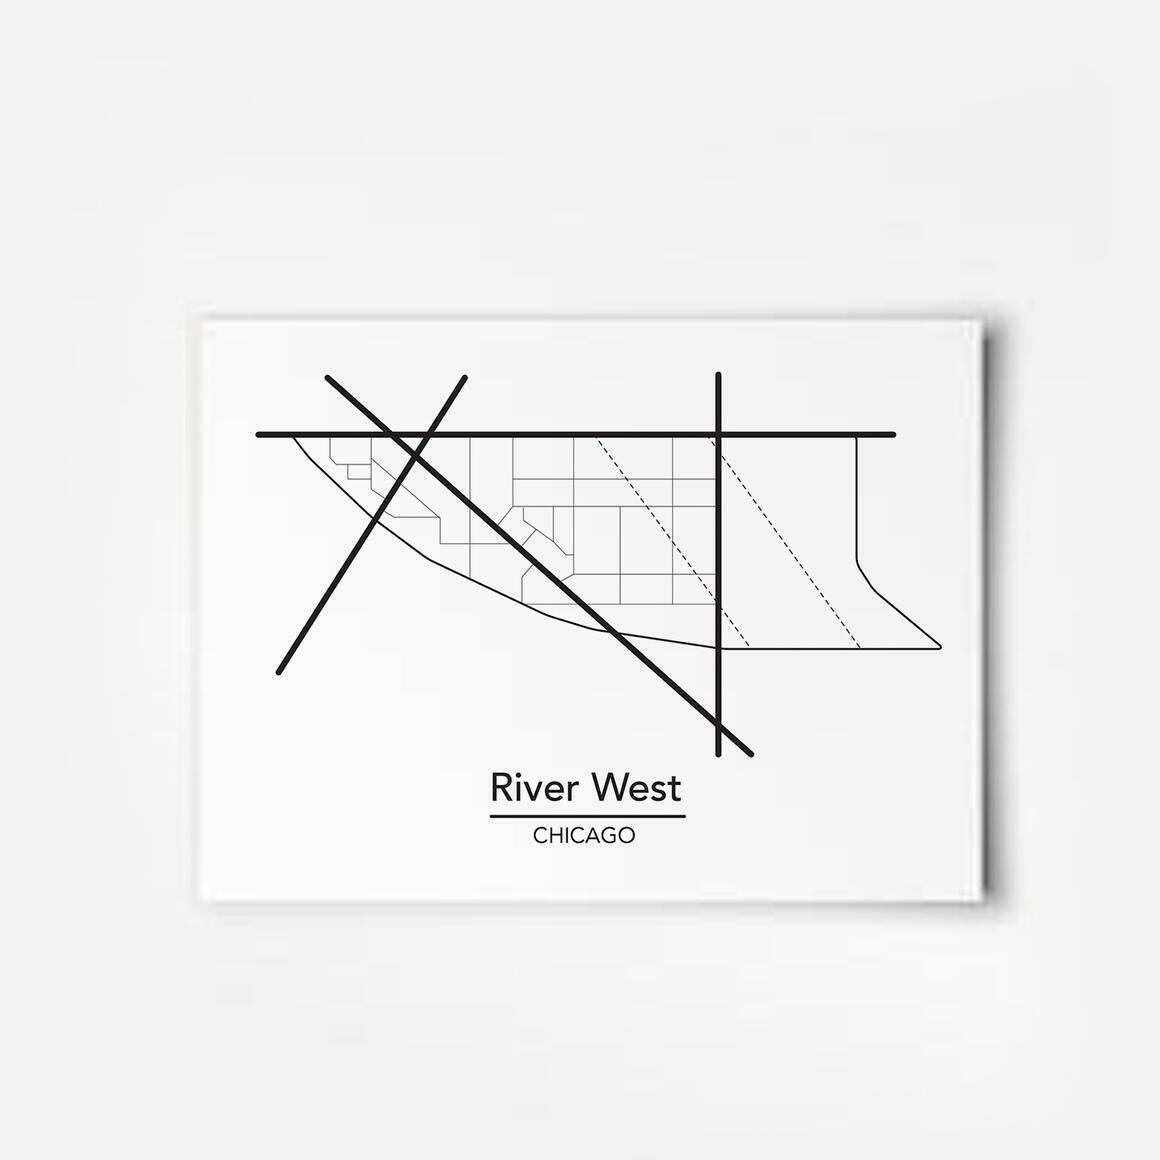 River West - Chicago Neighborhood Map Print | Trada Marketplace